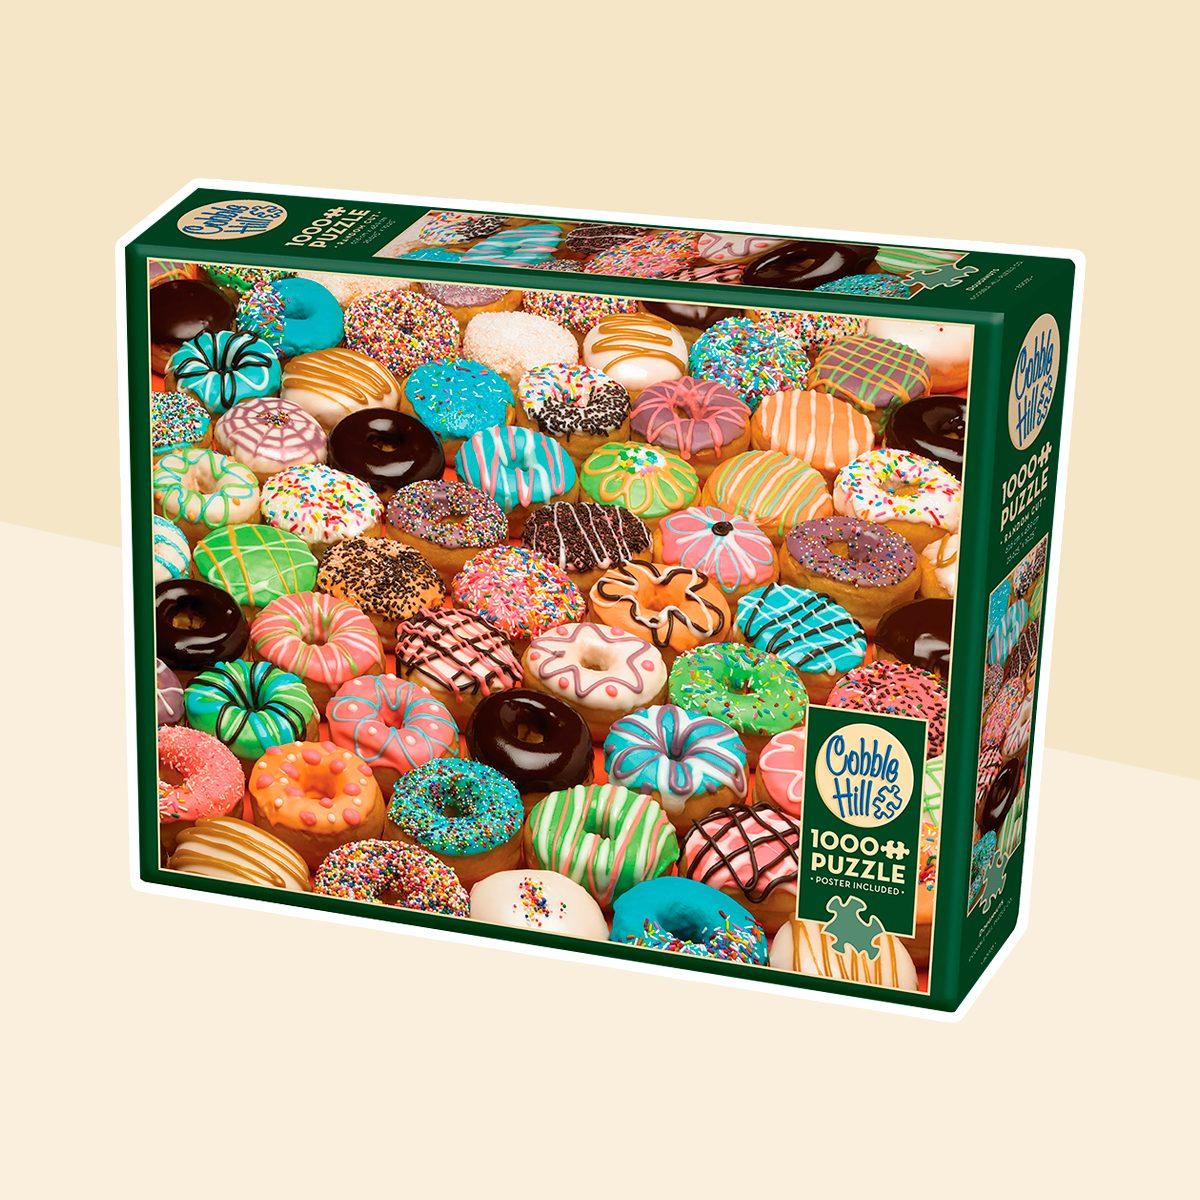 Cobble Hill: Doughnuts 1000 Piece Jigsaw Puzzle